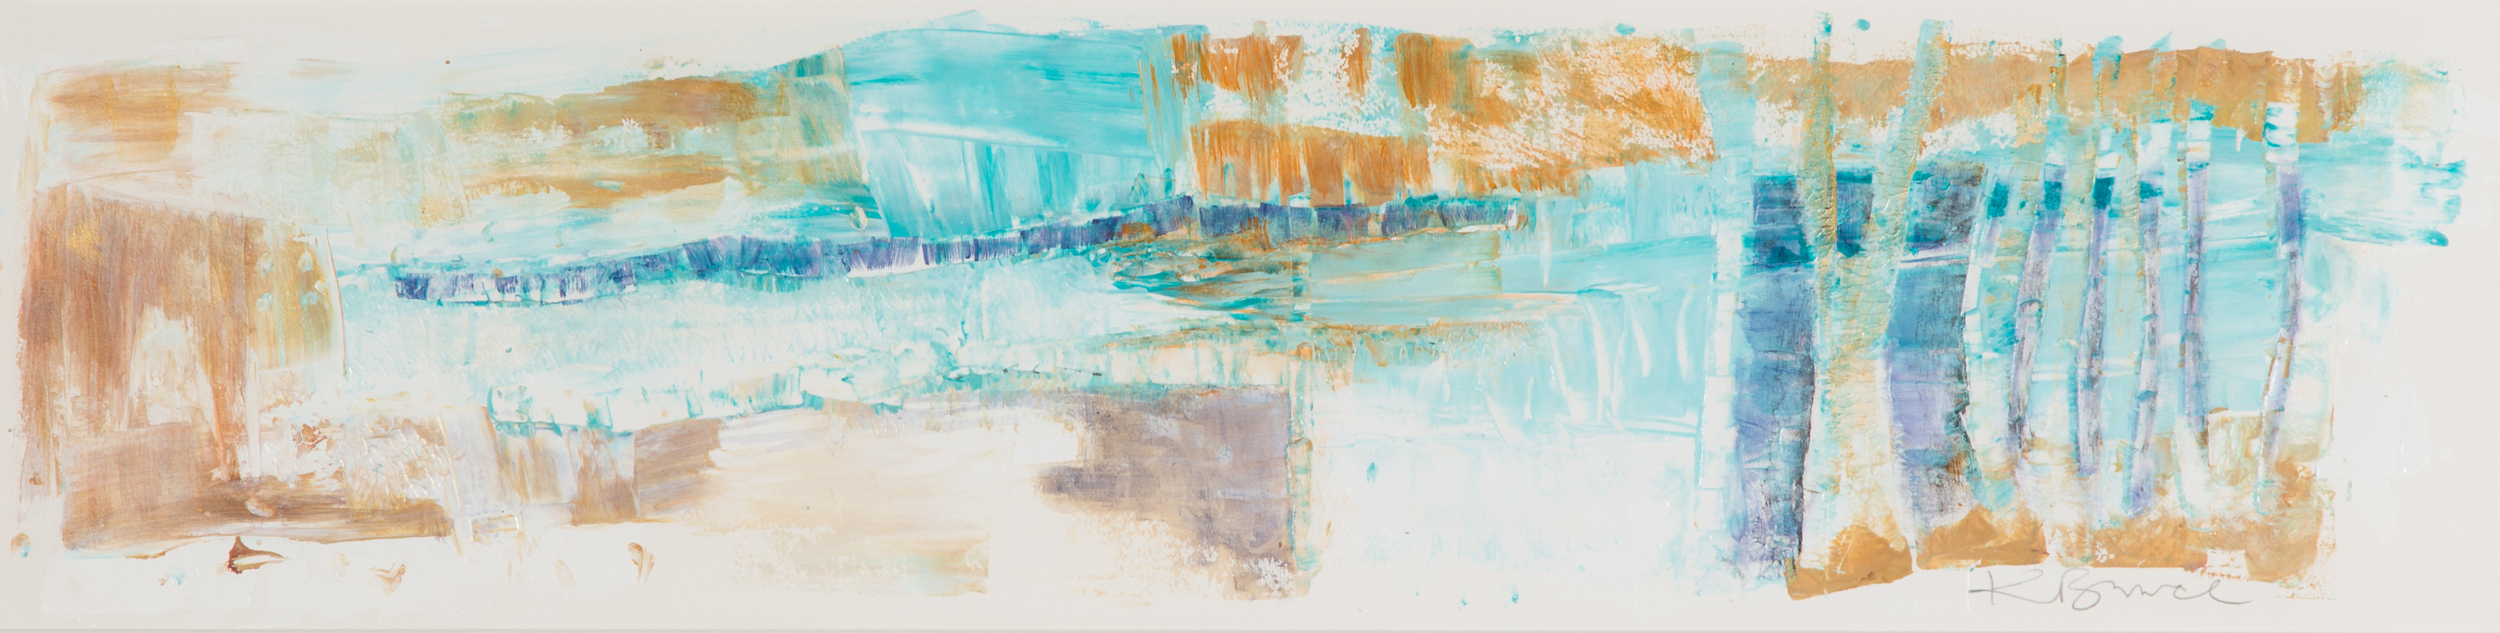 KB-069, Katharine Bruce, Mirage de la Prairie, Acrylic on Paper, 2015, 44x12 , $2,400